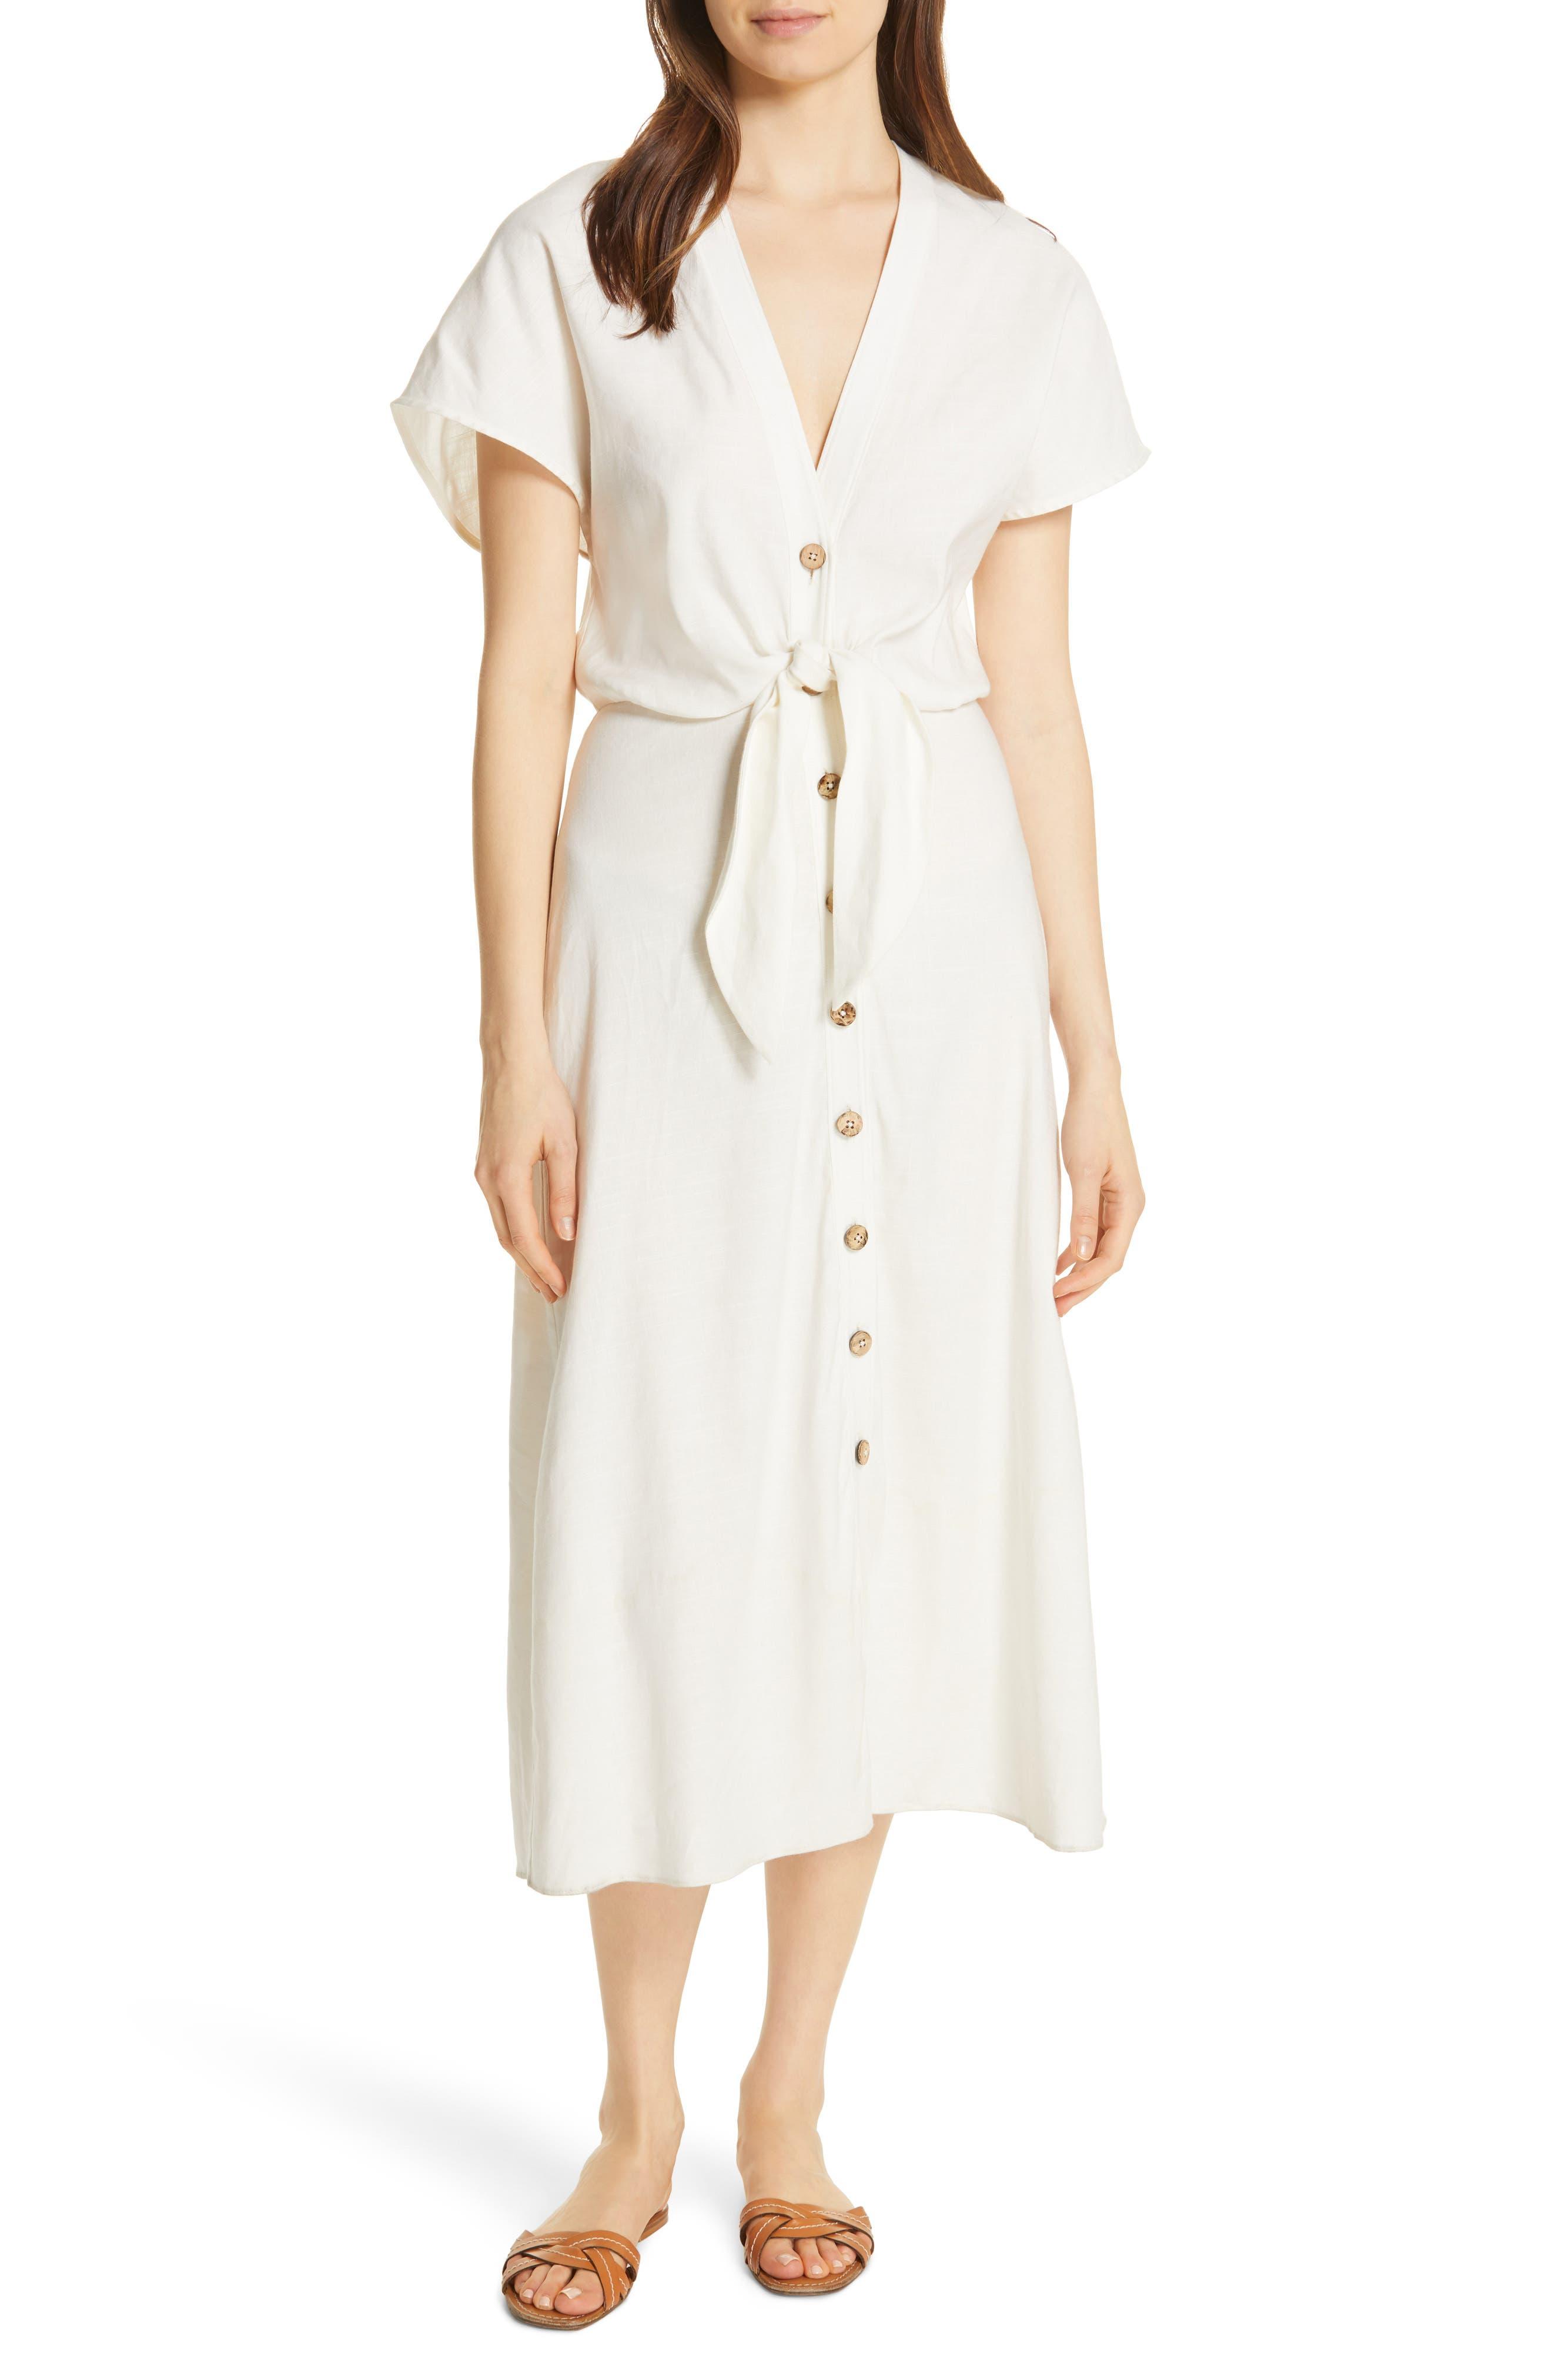 Veronica Beard Giana Tie Waist Linen Blend Midi Dress, White